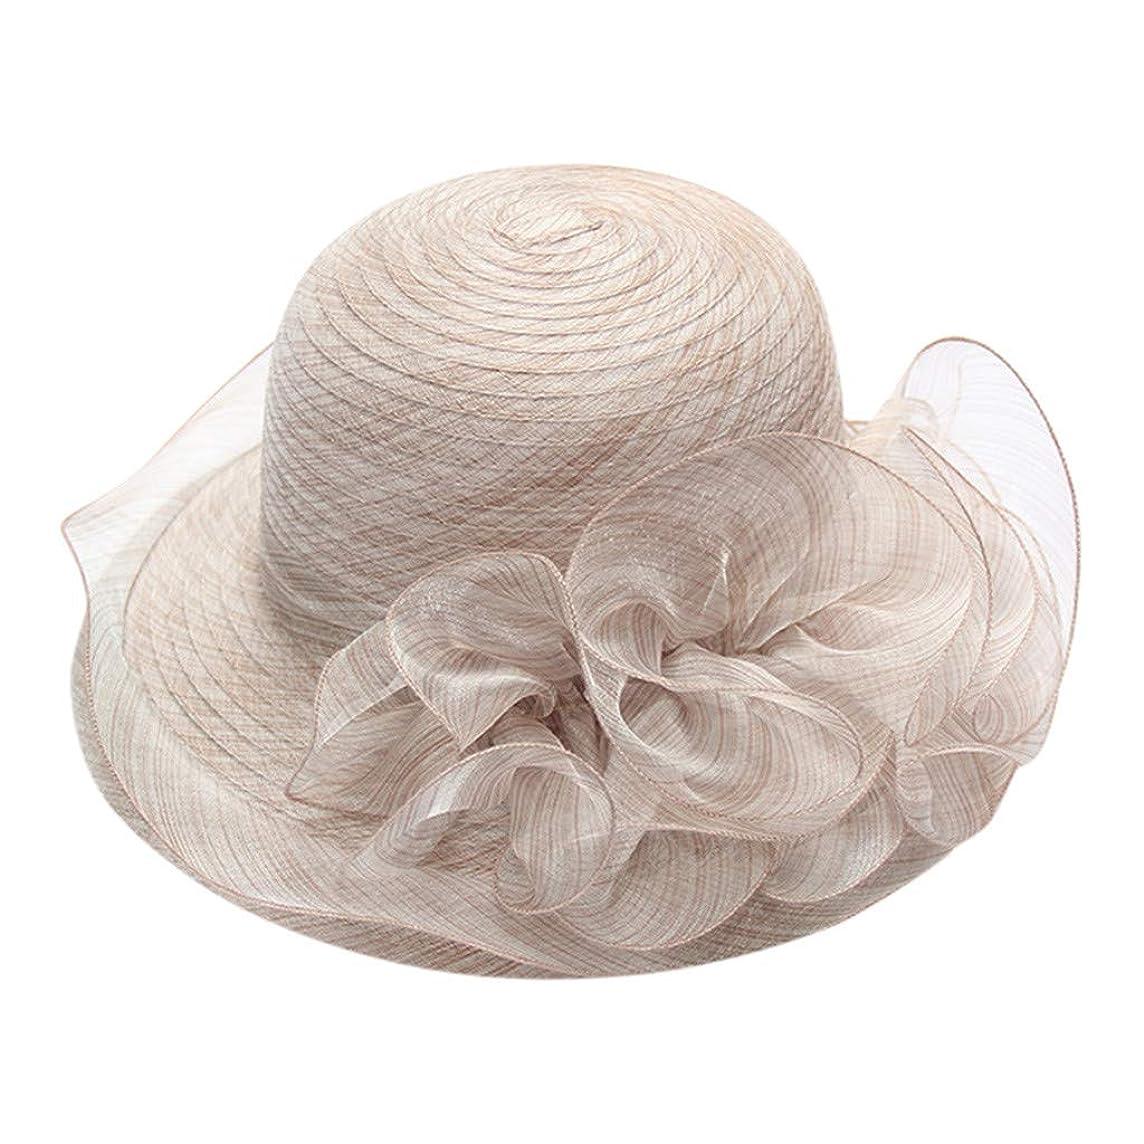 Togethor Wedding Hat Women's Organza Church Bridal Tea Party Summer organza big along the basin cap folding beach hat